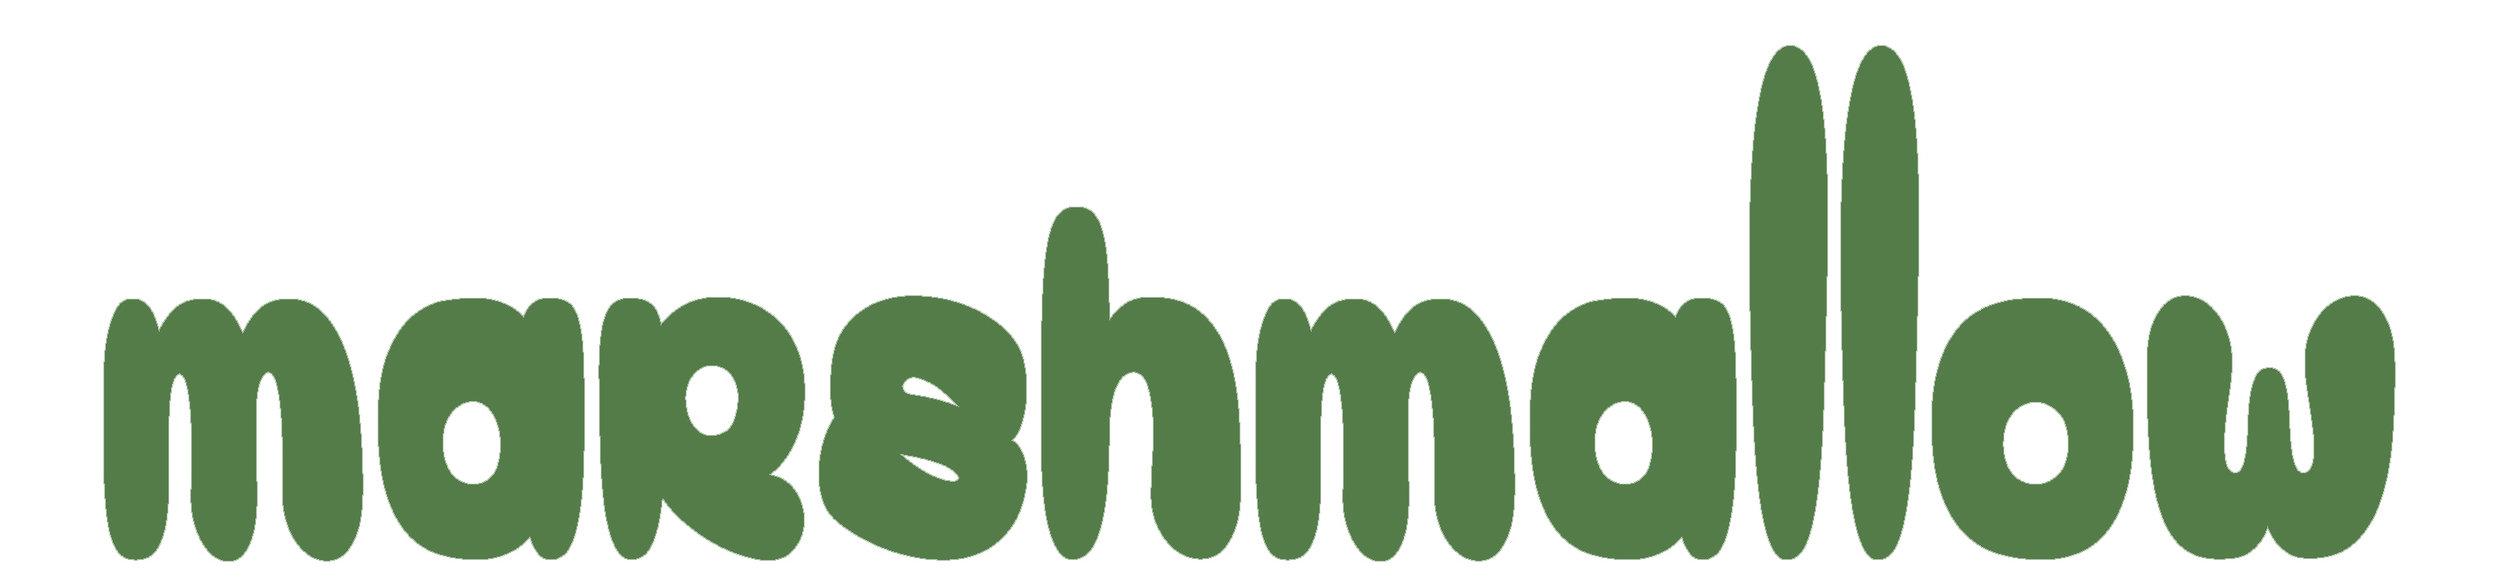 marshmallow logo green.jpg